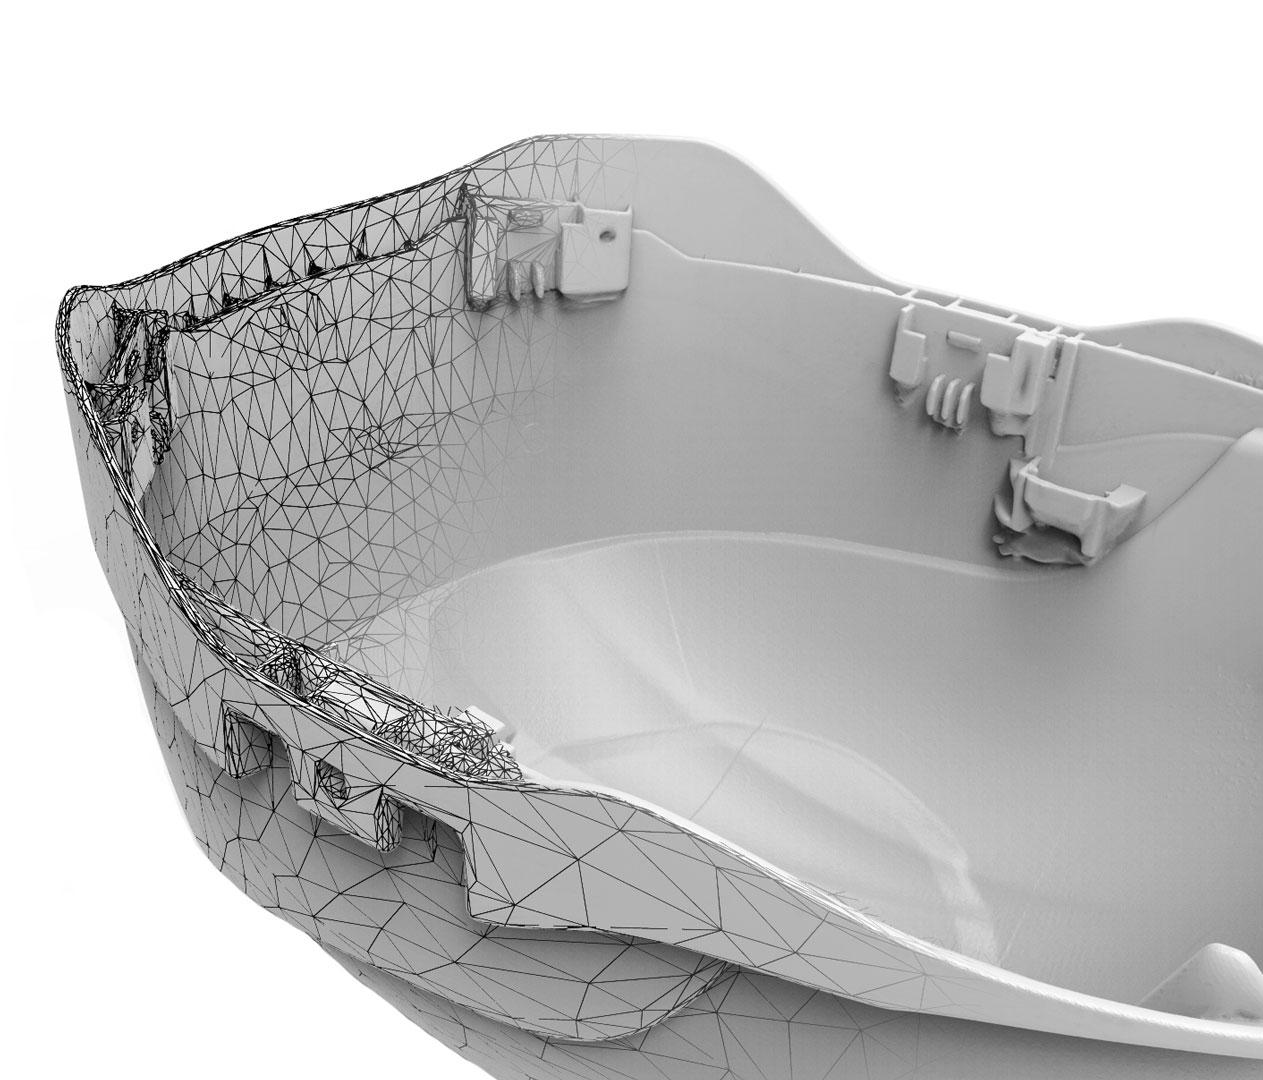 3D Scanning Ireland Dublin Artec Reverse Engineering Product Design Development